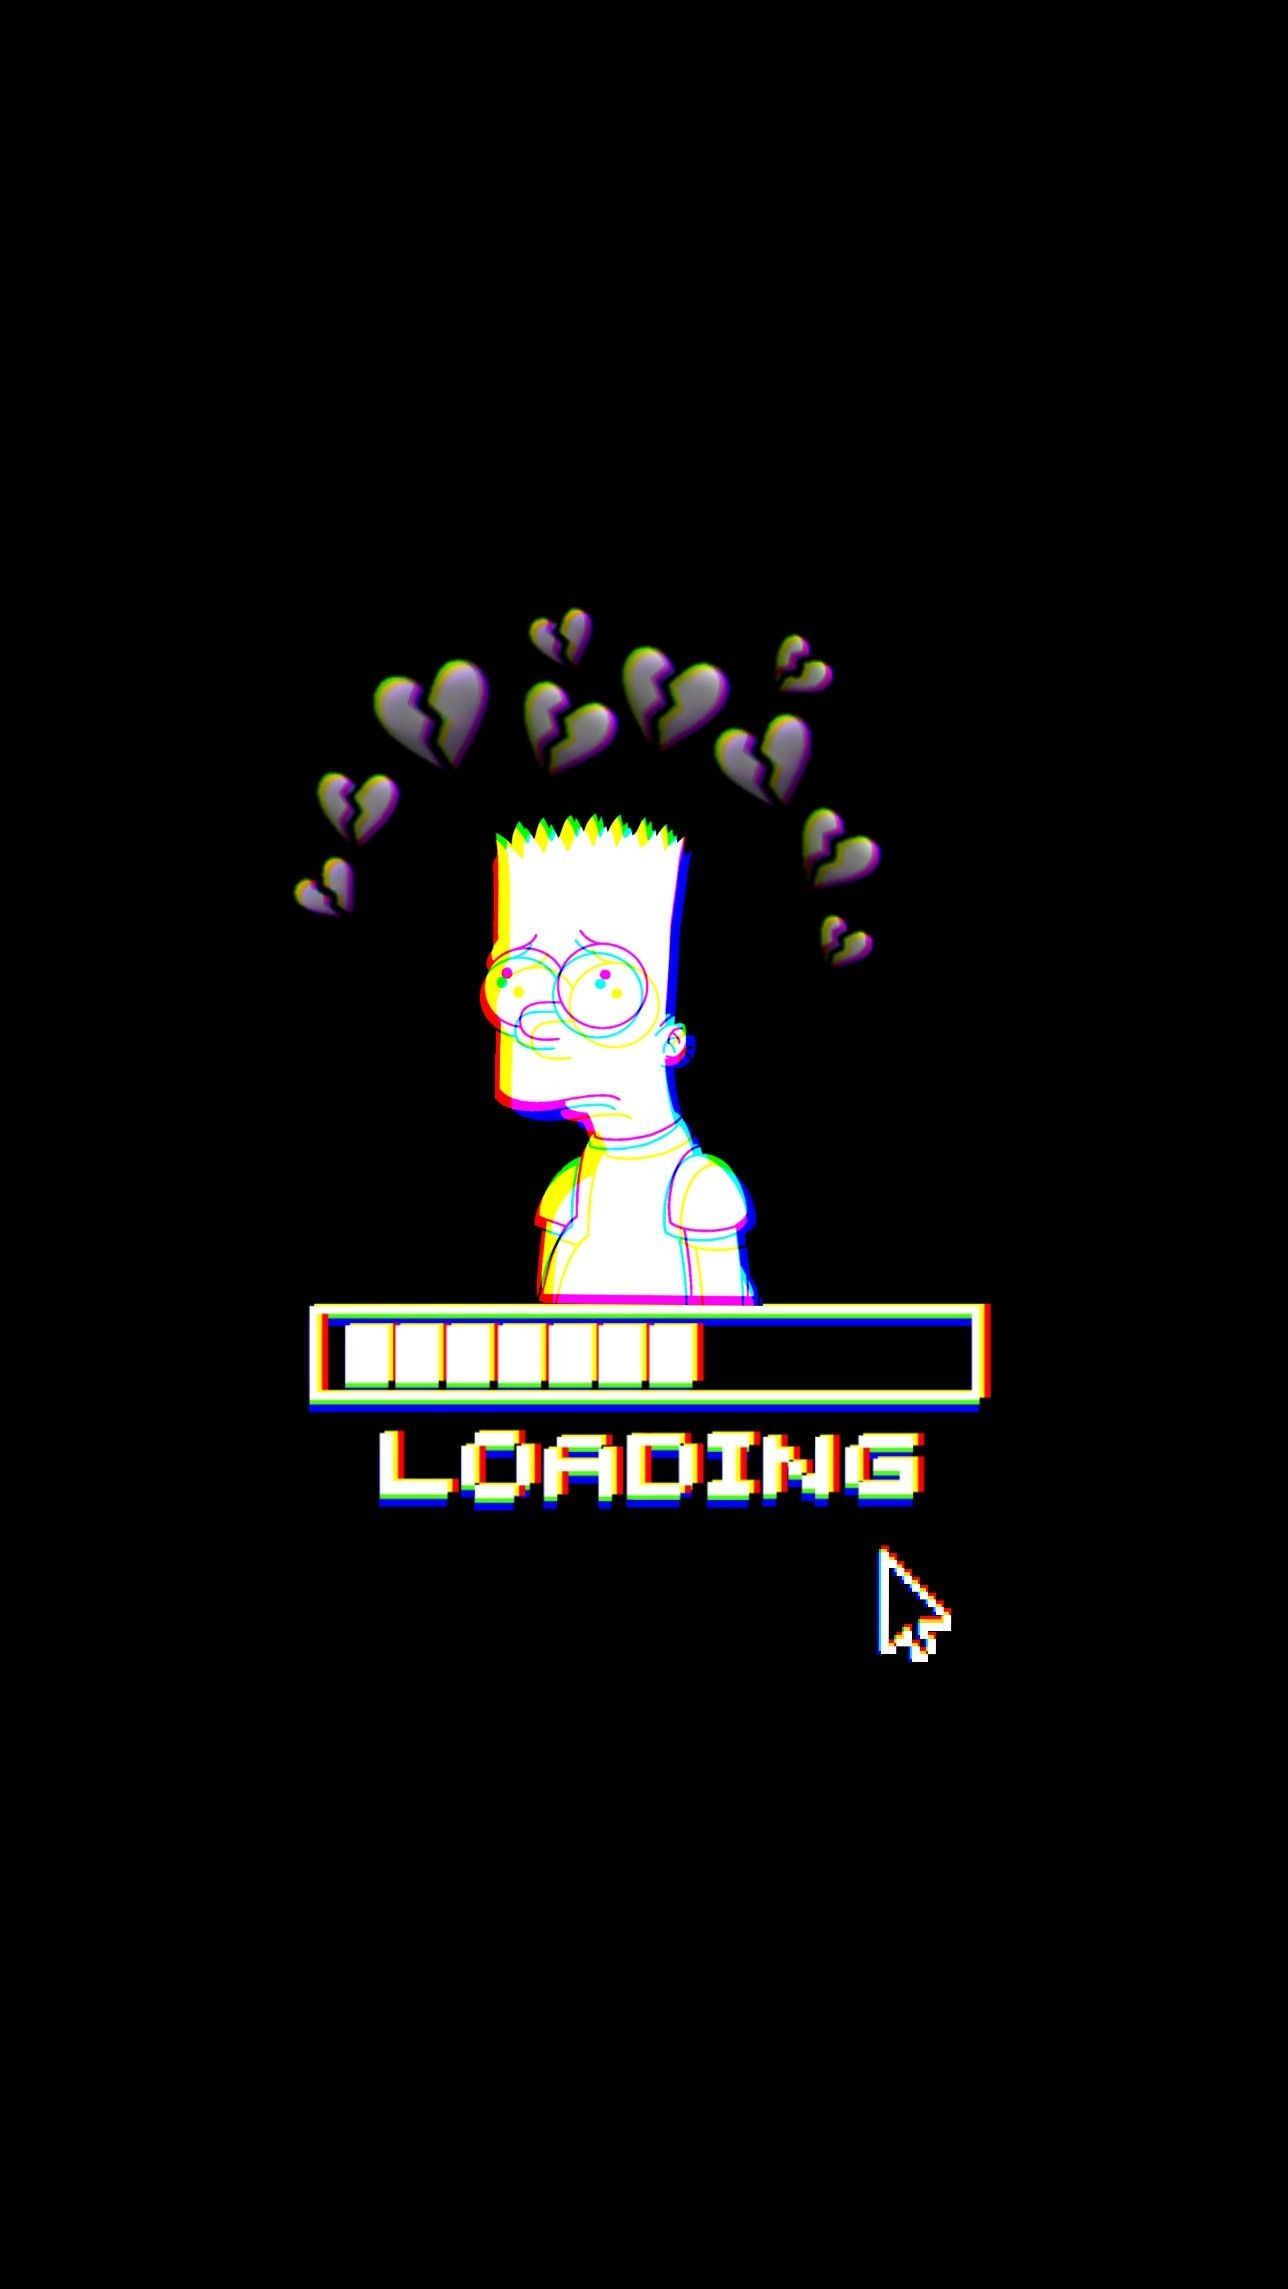 Loading Emoji : loading, emoji, Freetoedit, #aycaramba, #heartbroken, #loading, #glitch, #wallpaper, #background, #remixit, Glitch, Wallpaper,, Emoji, Wallpaper, Iphone